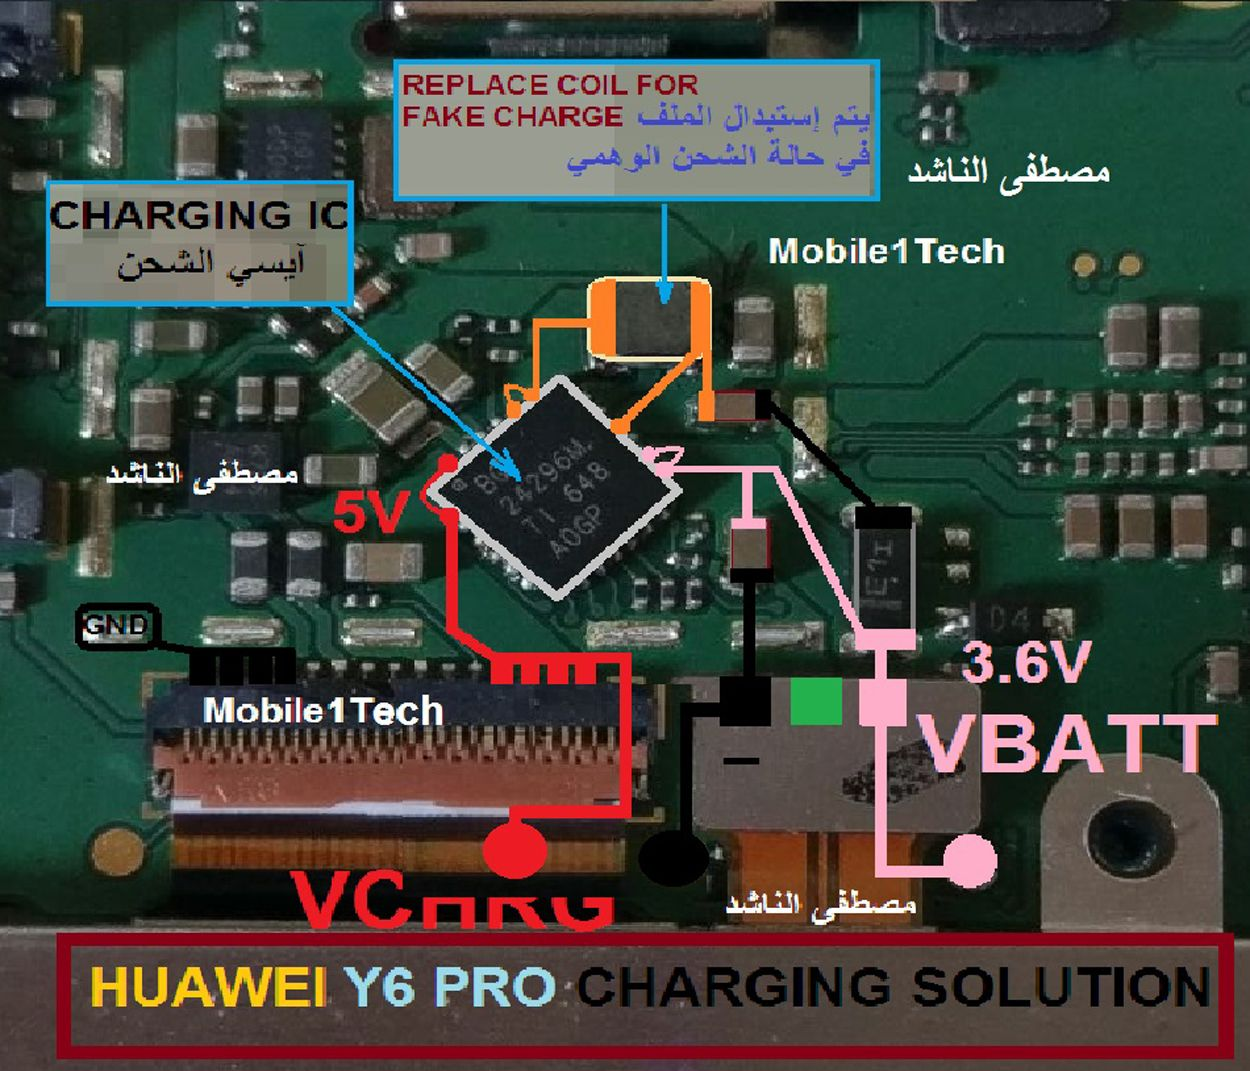 huawei y6 pro charging solution jumper problem ways [ 1250 x 1071 Pixel ]